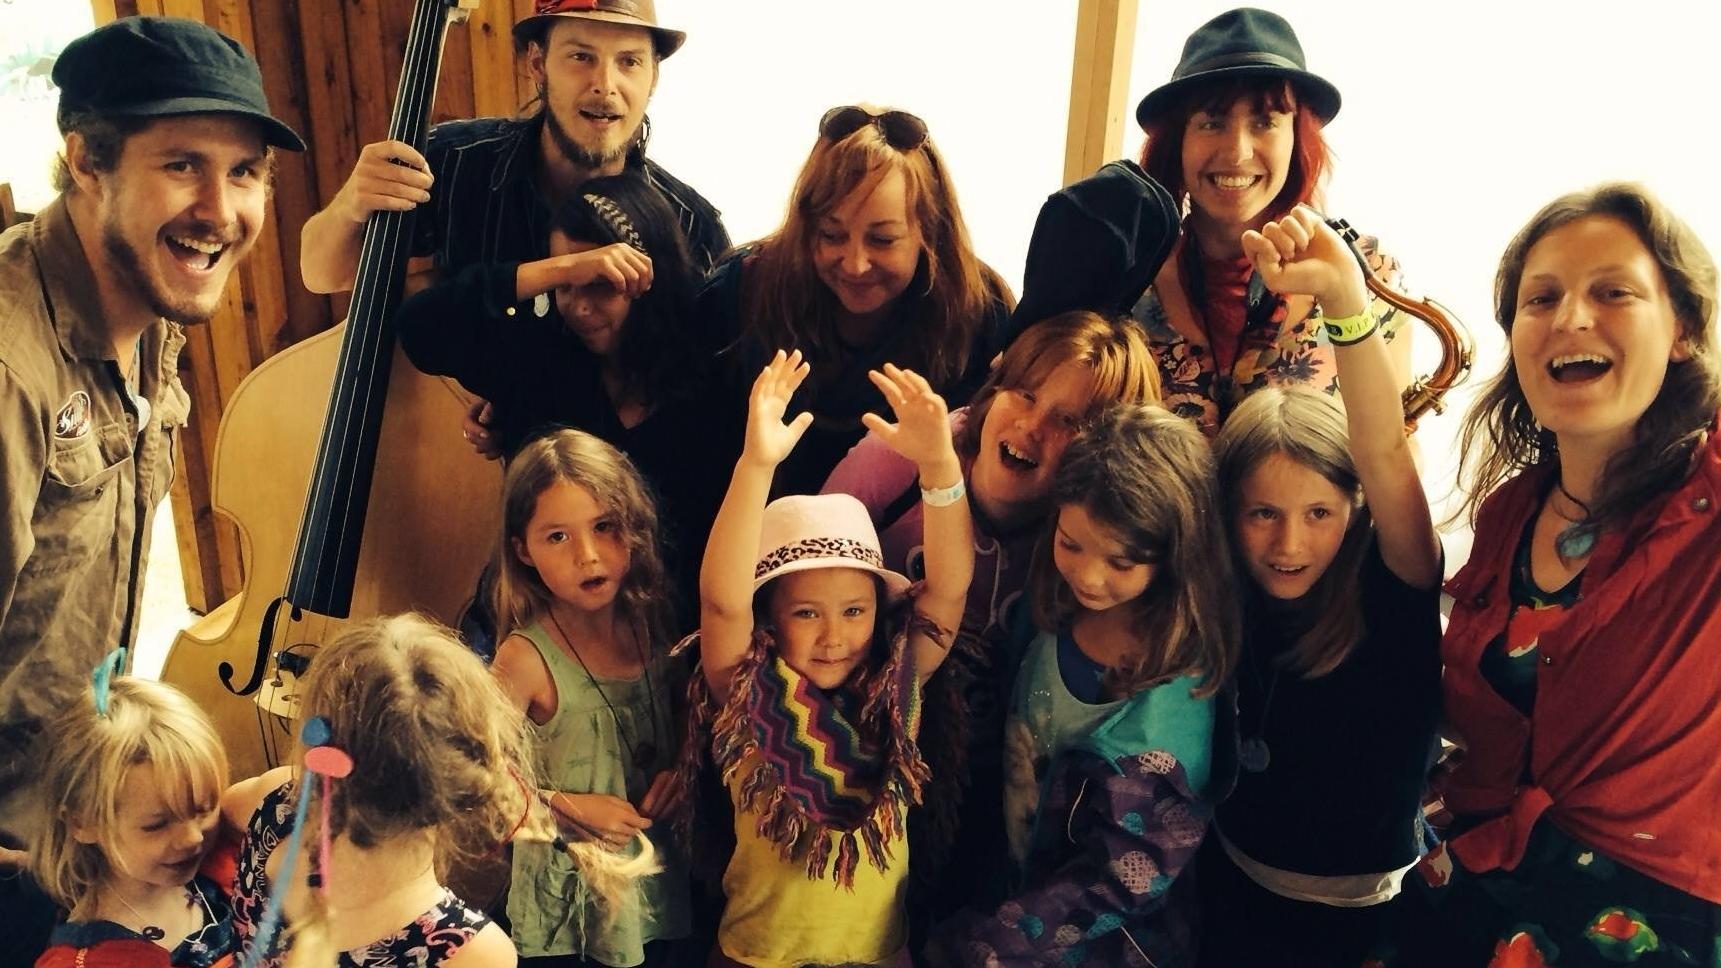 Edge of the World Festival in Haida Gwaii, 2014 - Founding Program